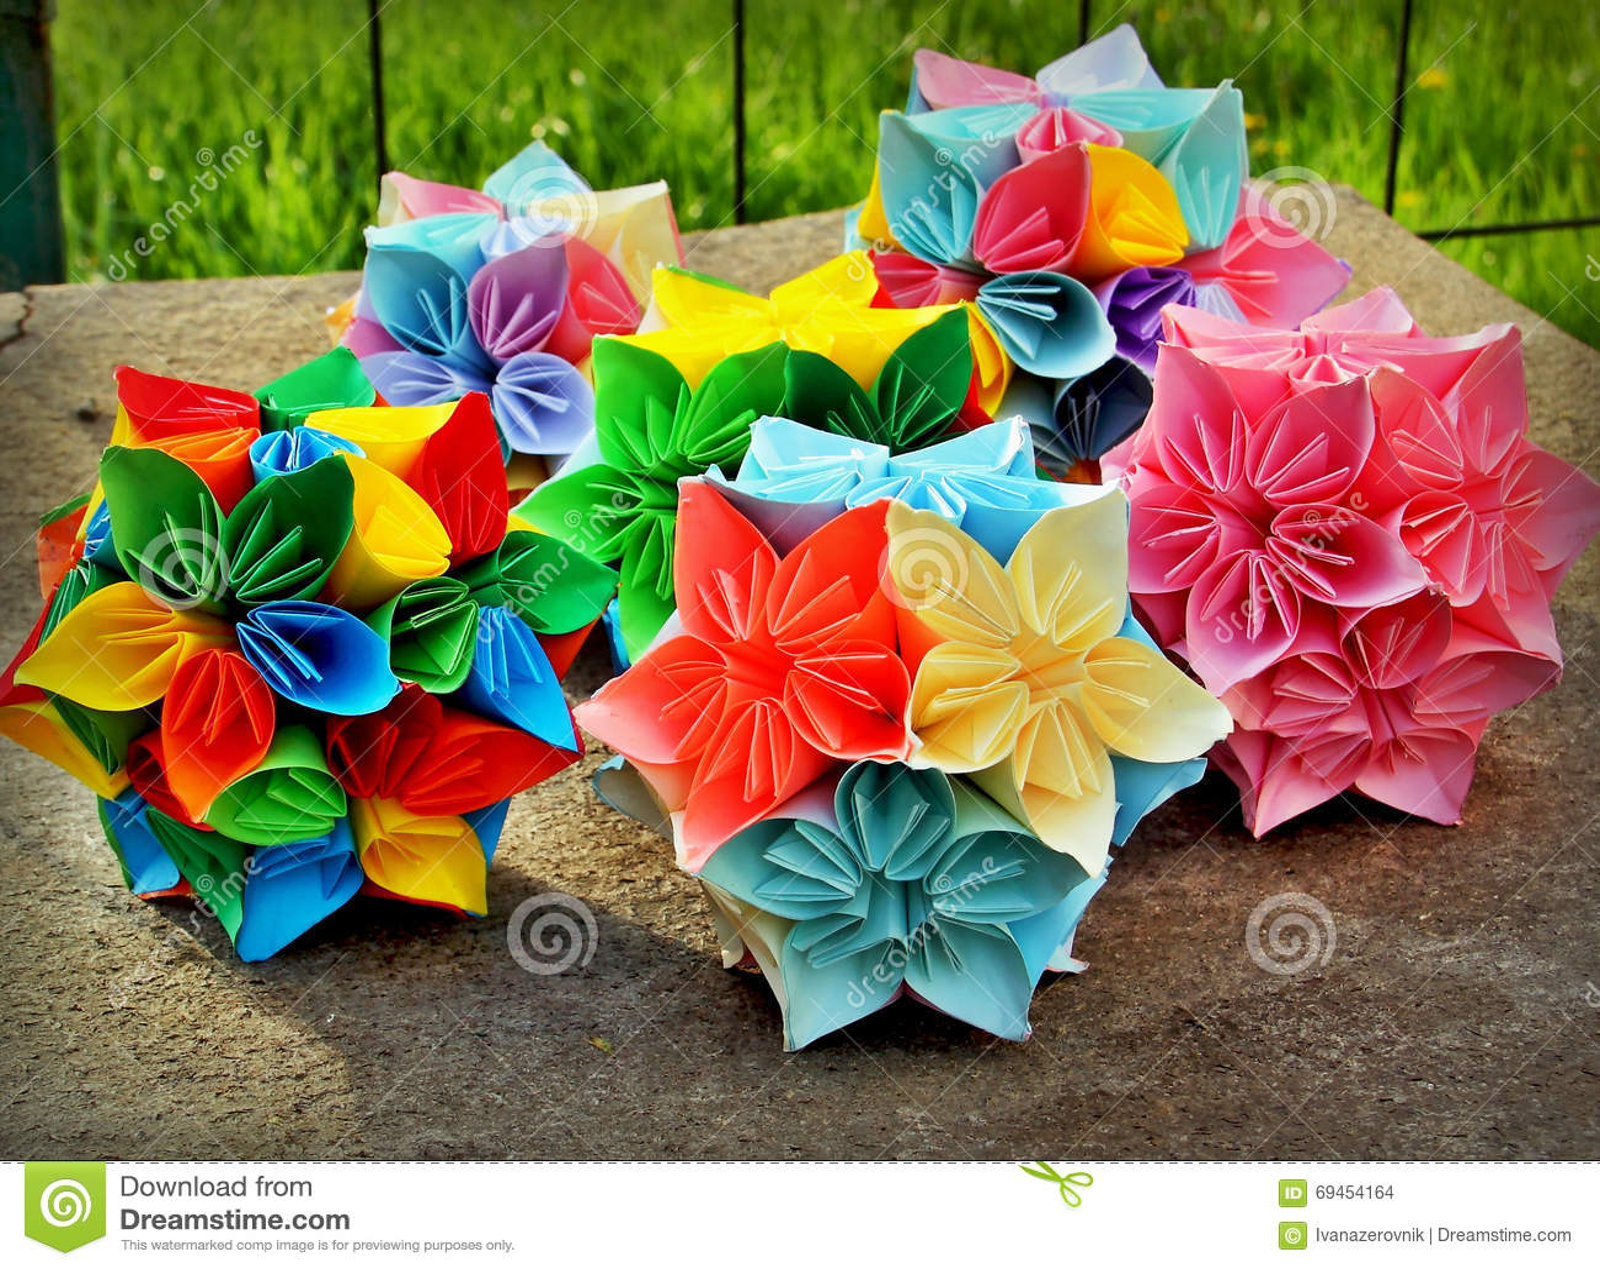 Origami flower balls stock photo image of colors decoration 69454164 download origami flower balls stock photo image of colors decoration 69454164 mightylinksfo